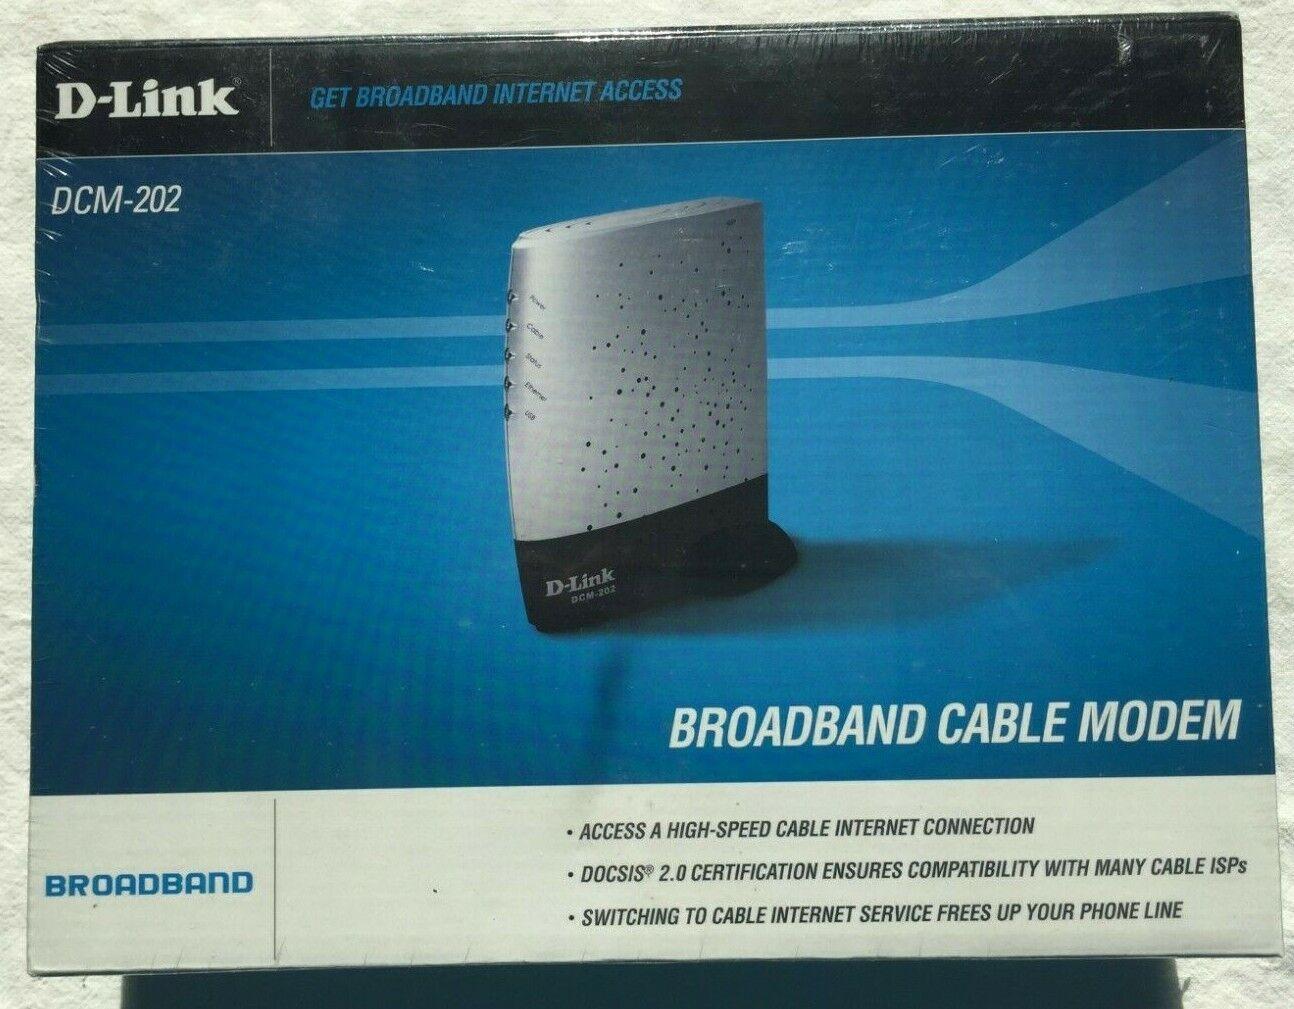 D-Link DCM-202 Broadband Modem / Brand New in Sealed Packagi